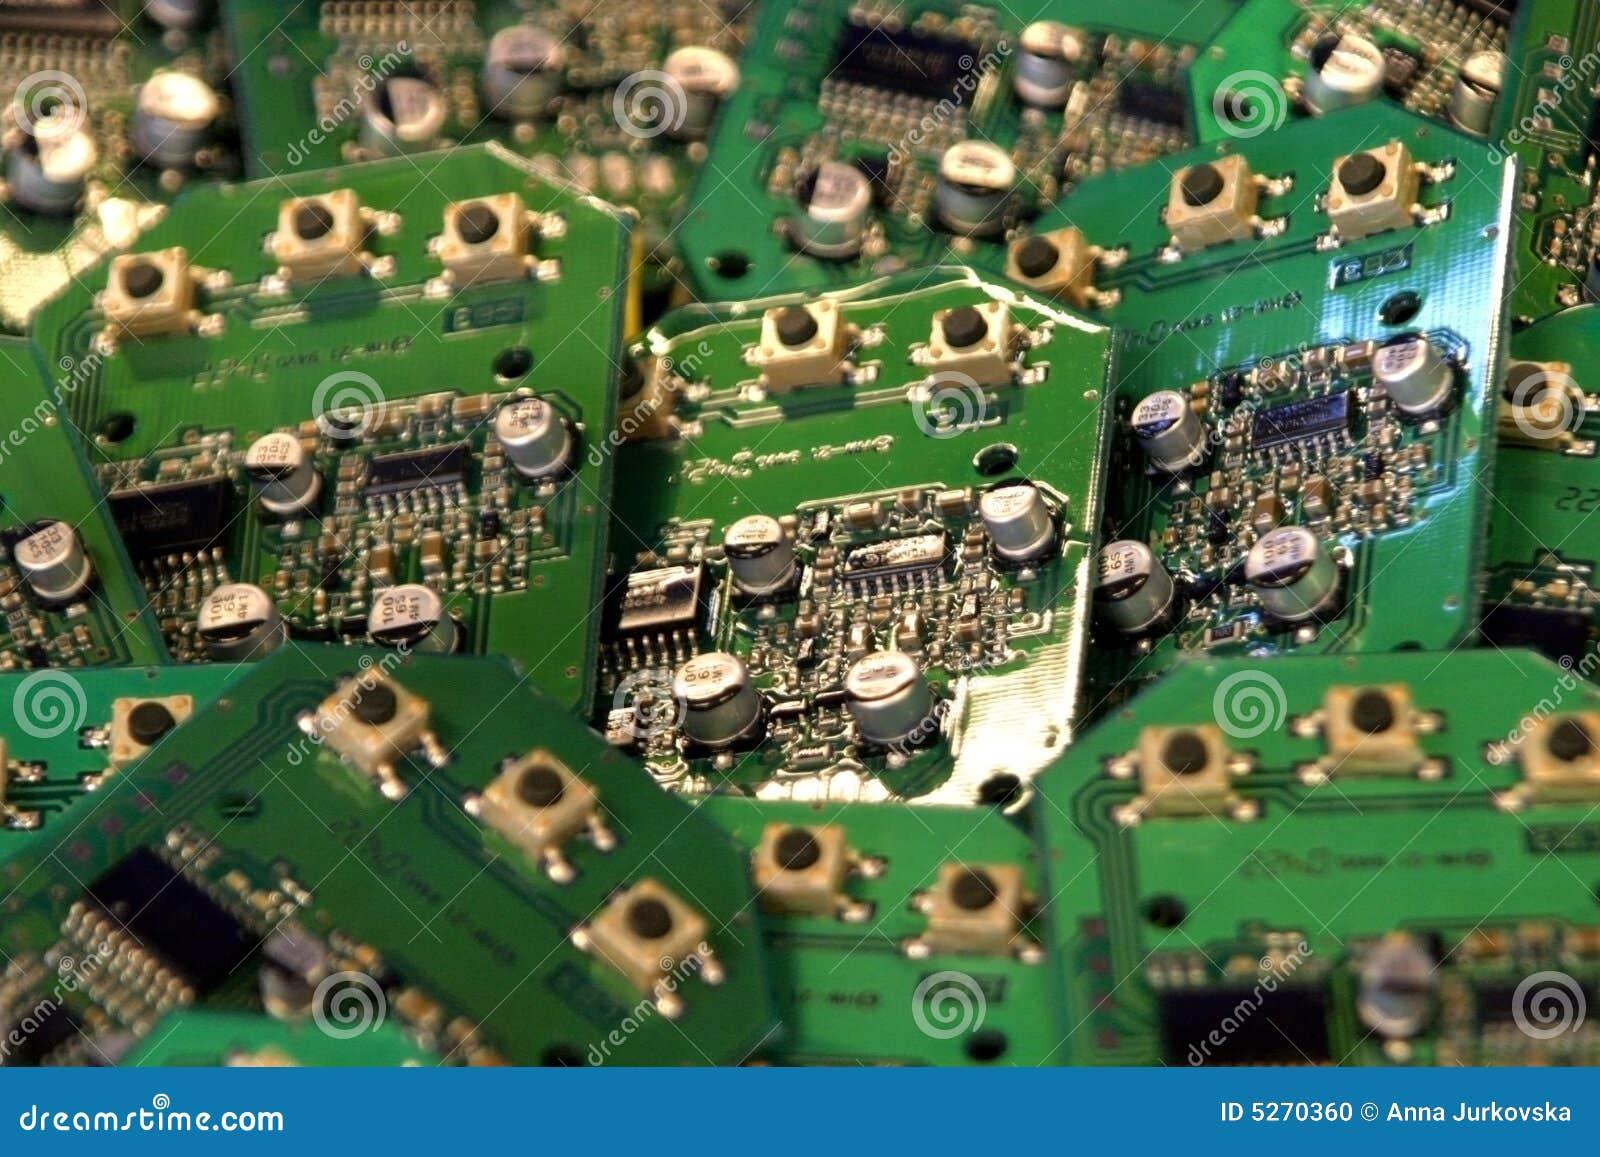 ebook Machinery Component Maintenance